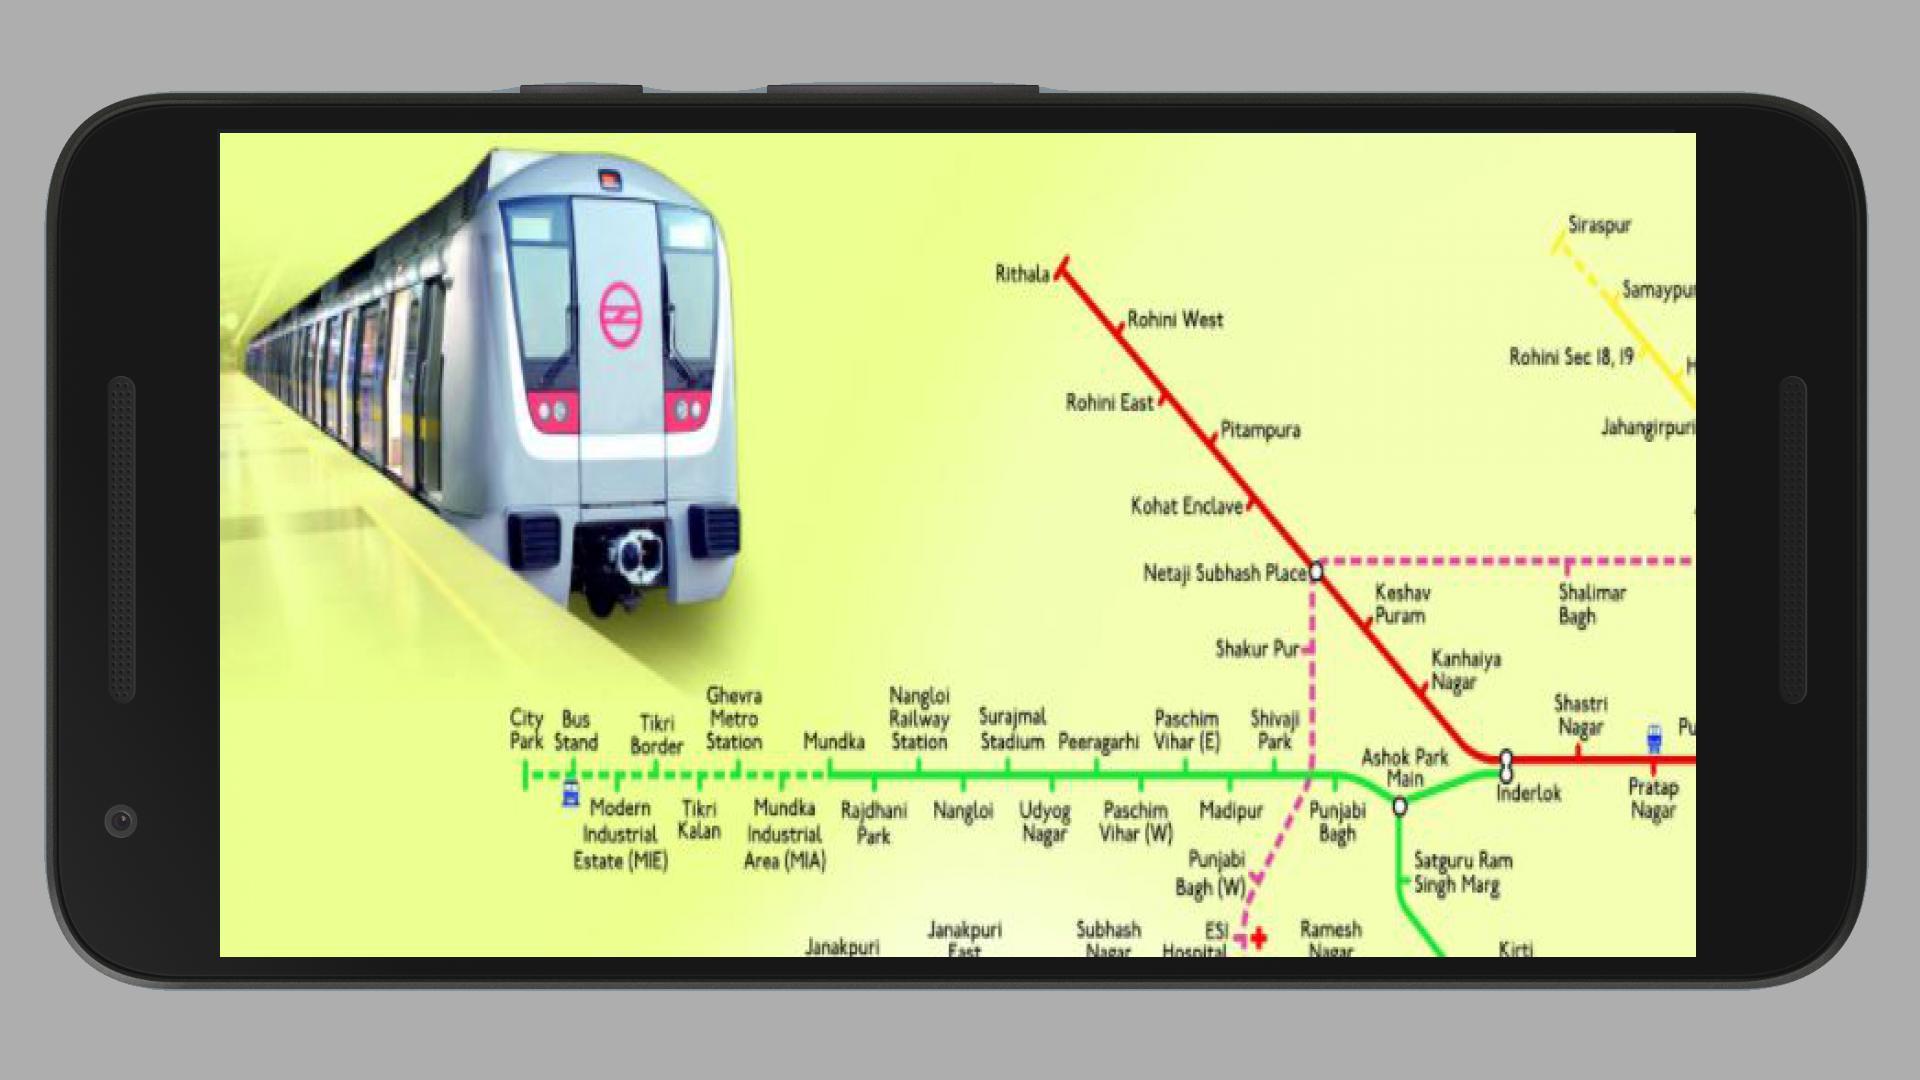 Delhi Metro Map Free New Fare, Route 2018 for Android - APK